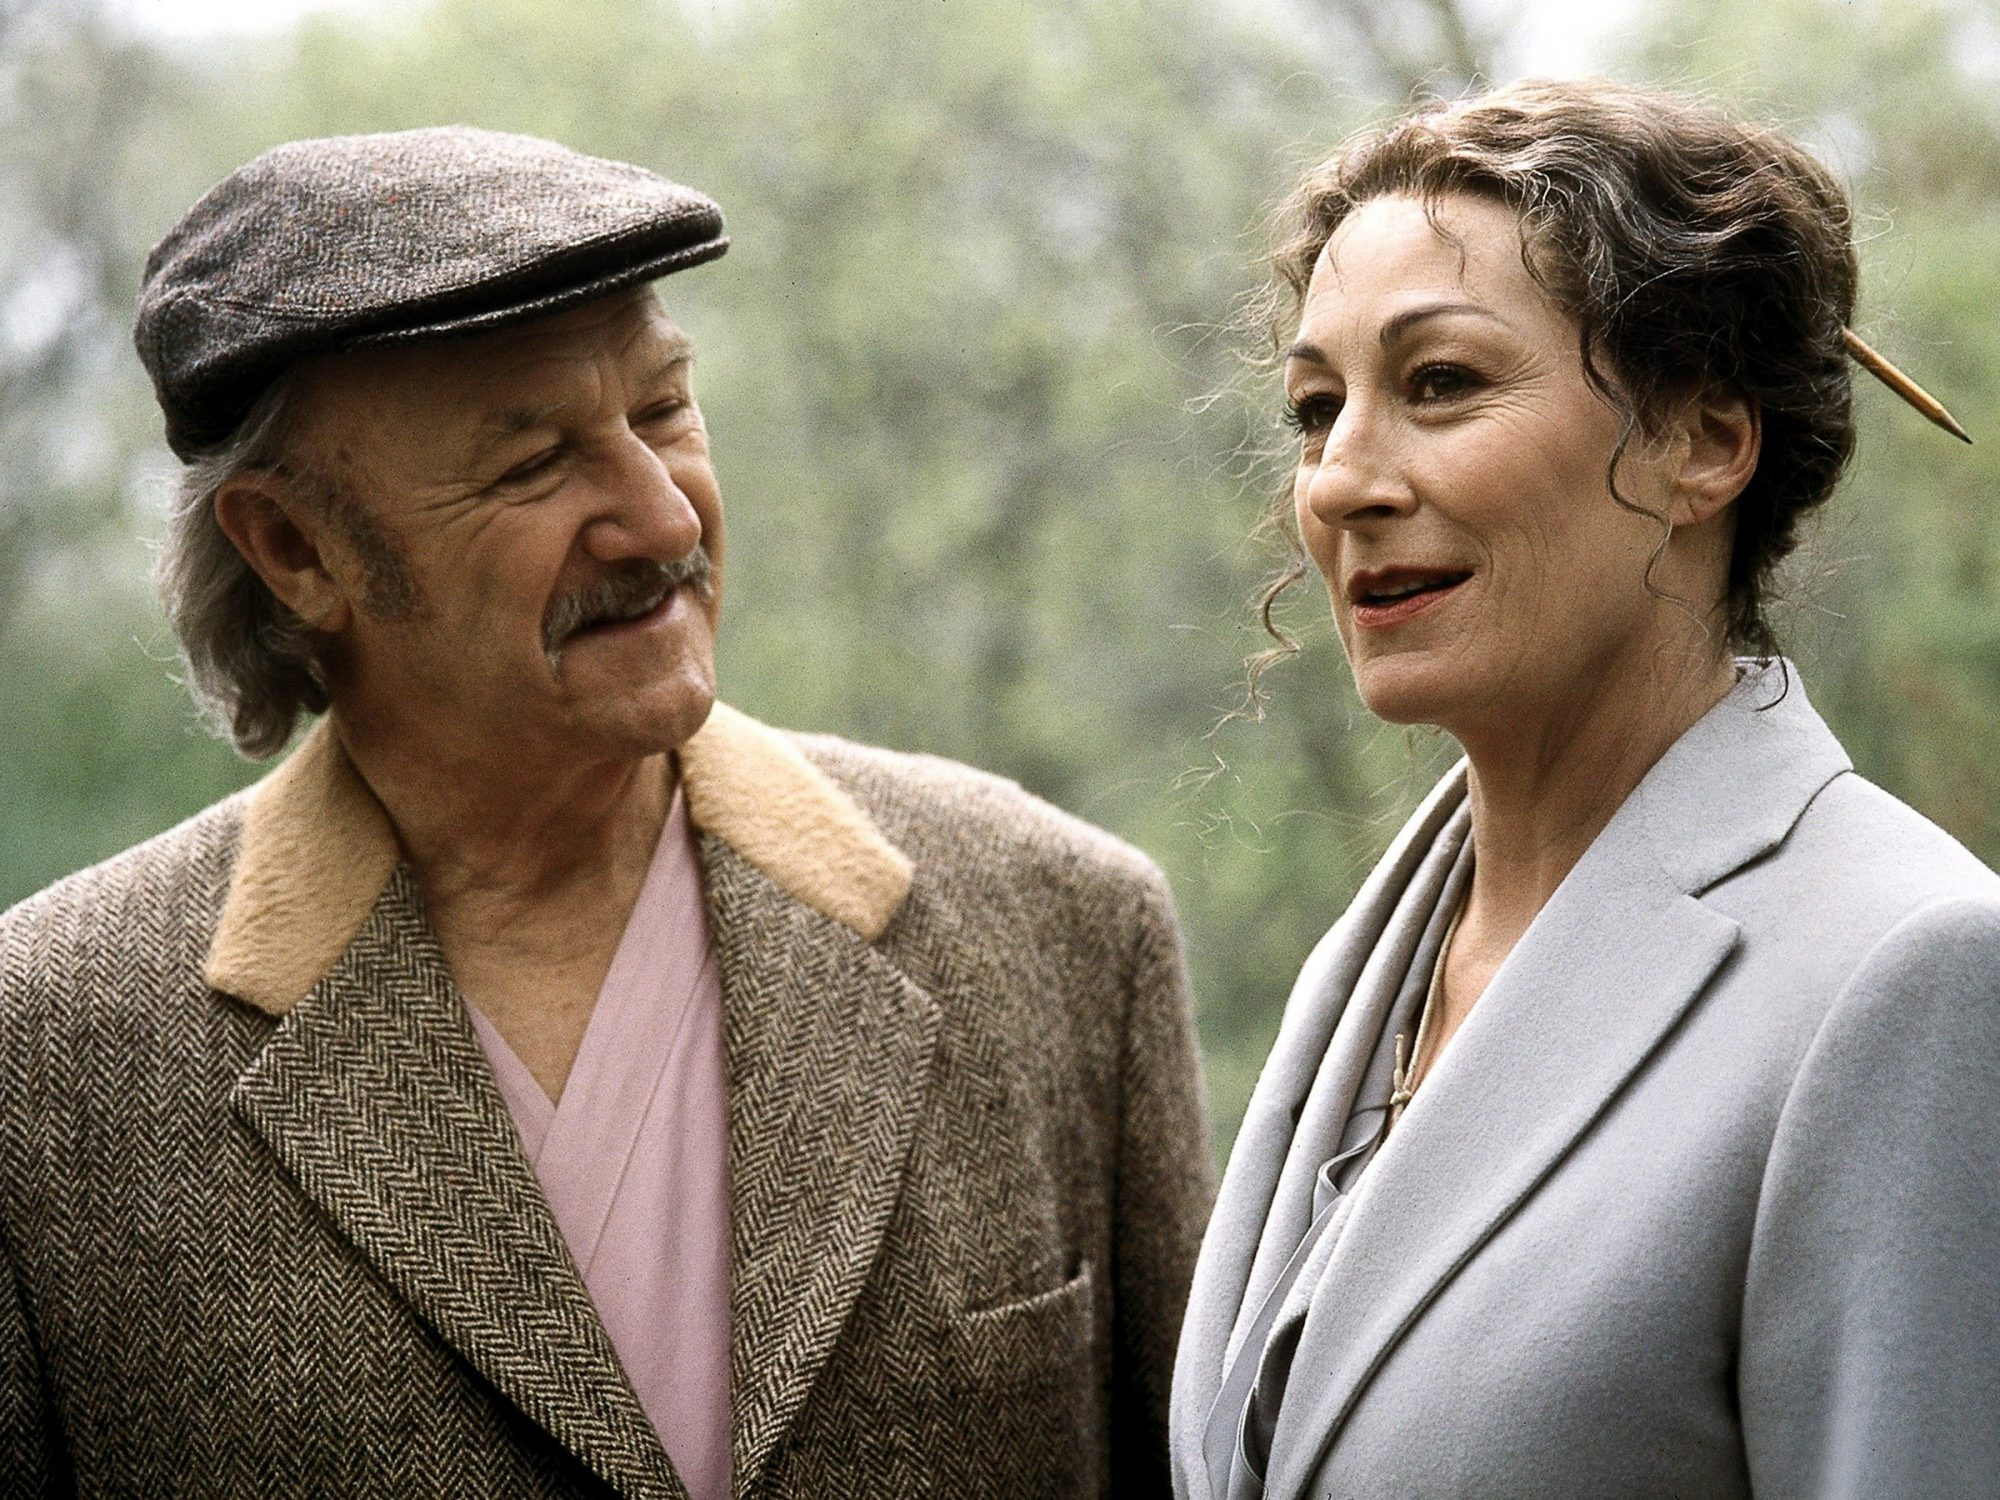 THE ROYAL TENENBAUMS, Gene Hackman, Anjelica Huston, 2001. (c) Buena Vista Pictures/Courtesy Everett